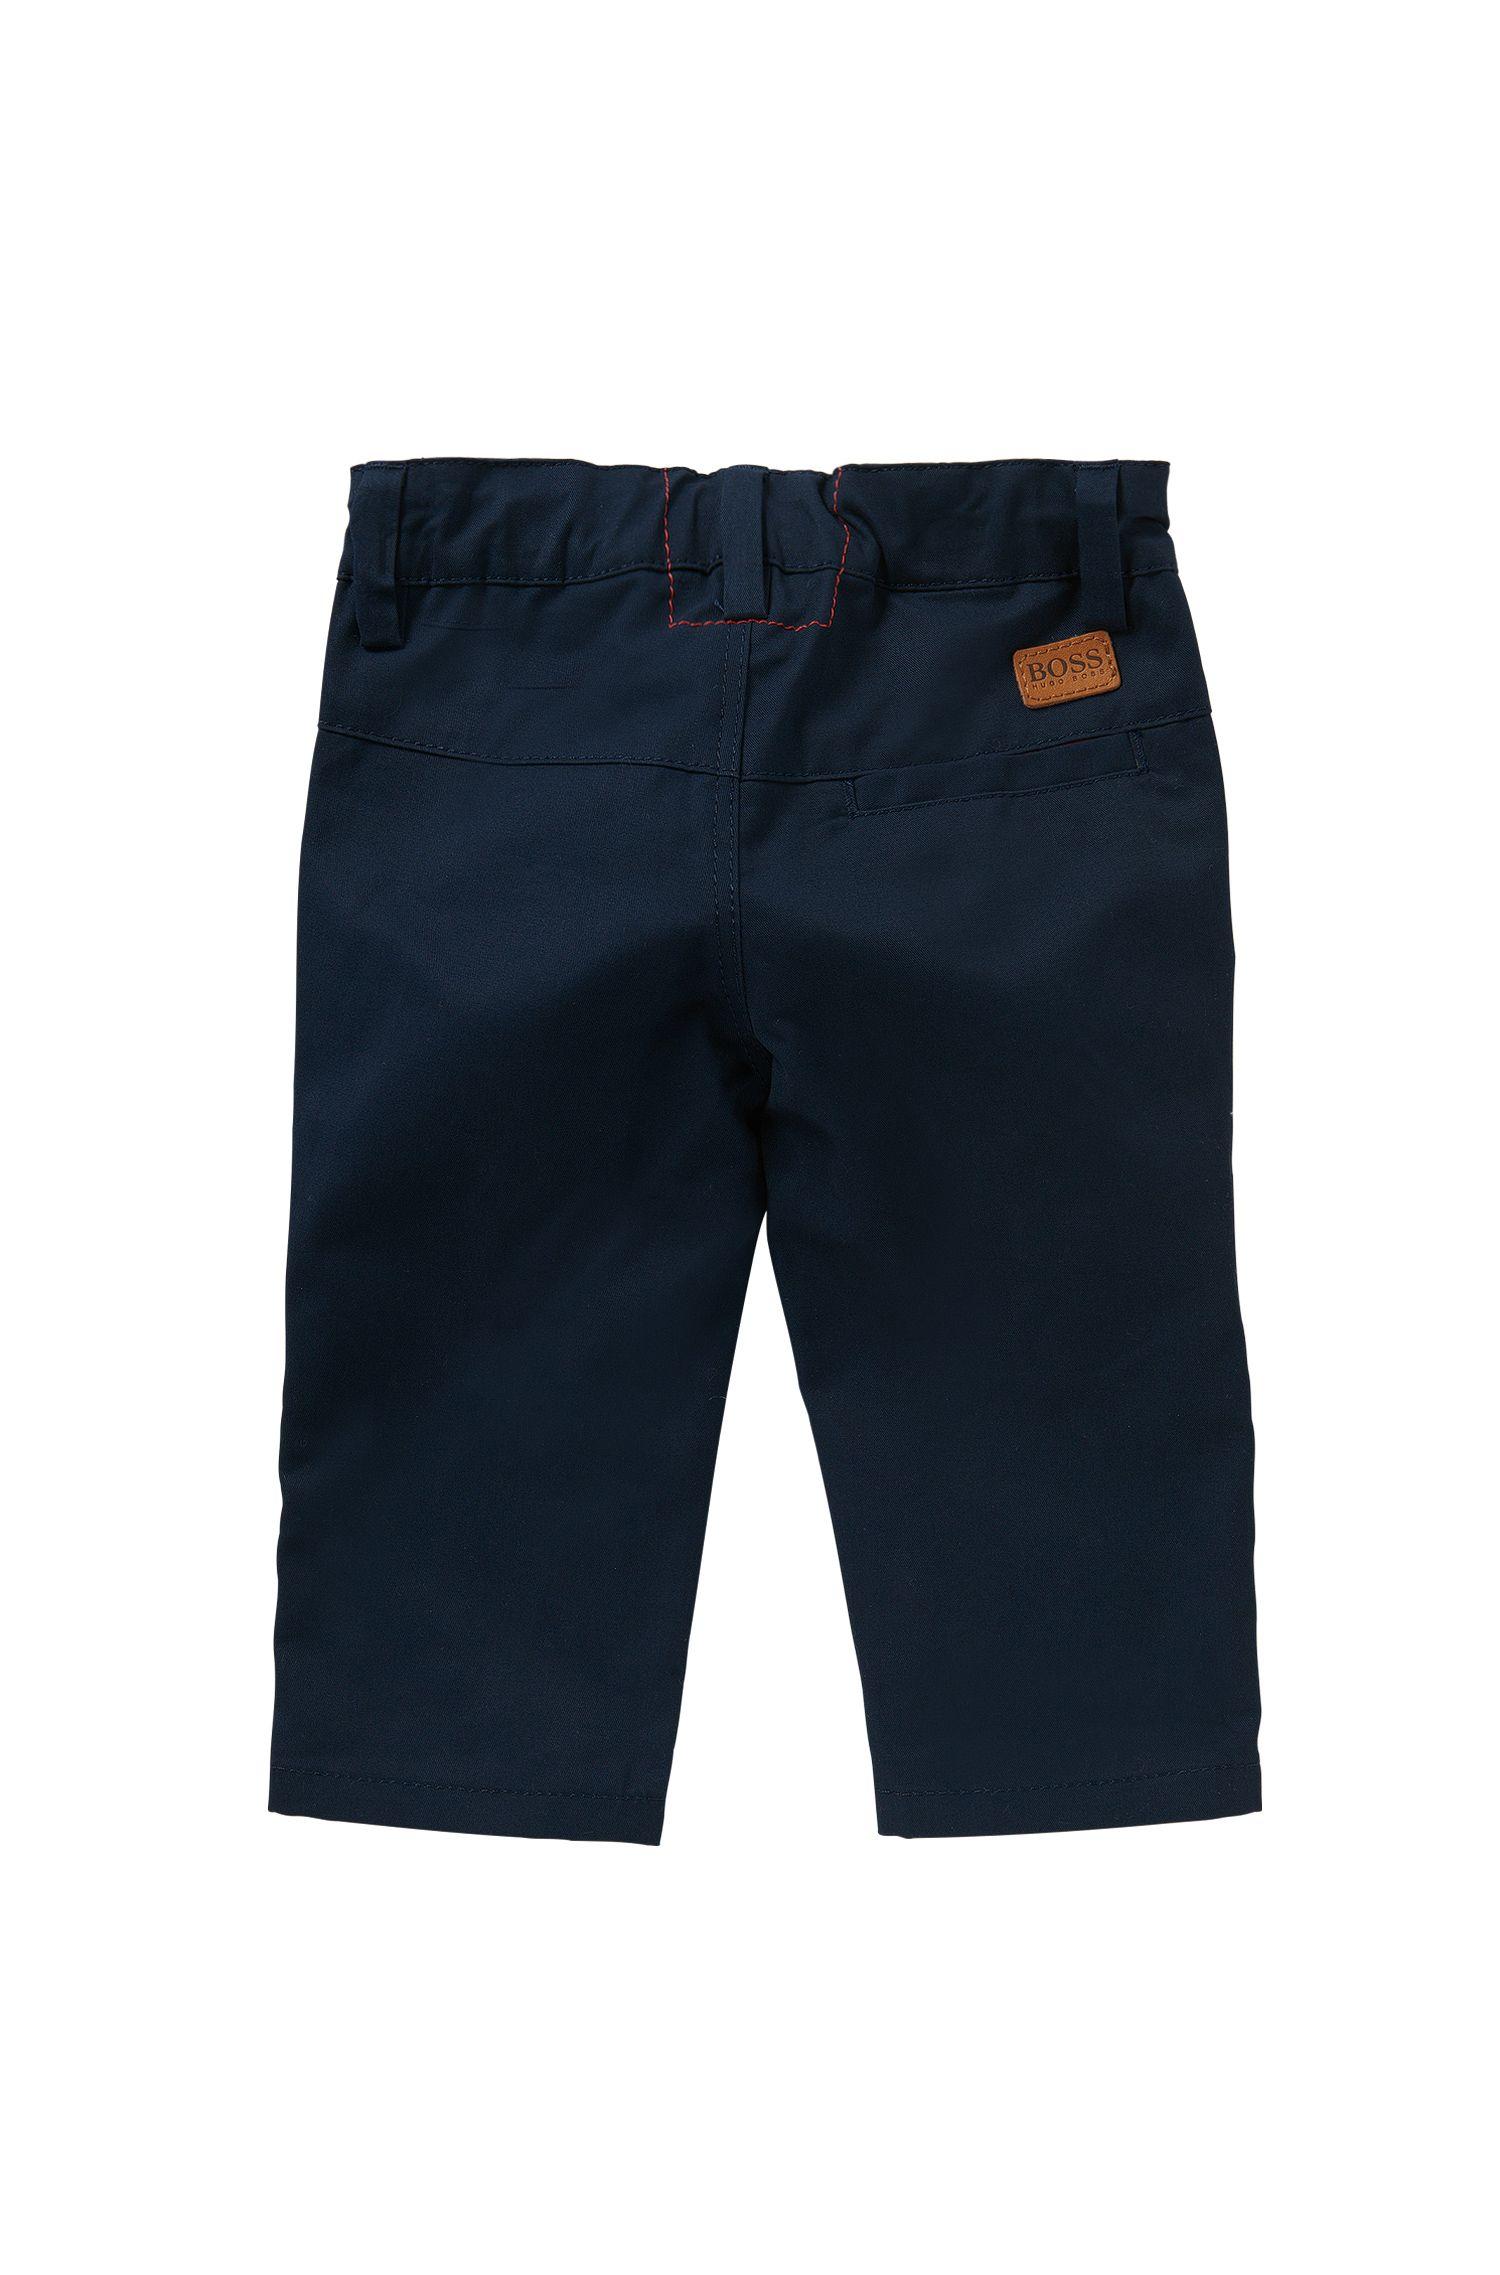 'J04227' | Toddler Cotton Twill Pants